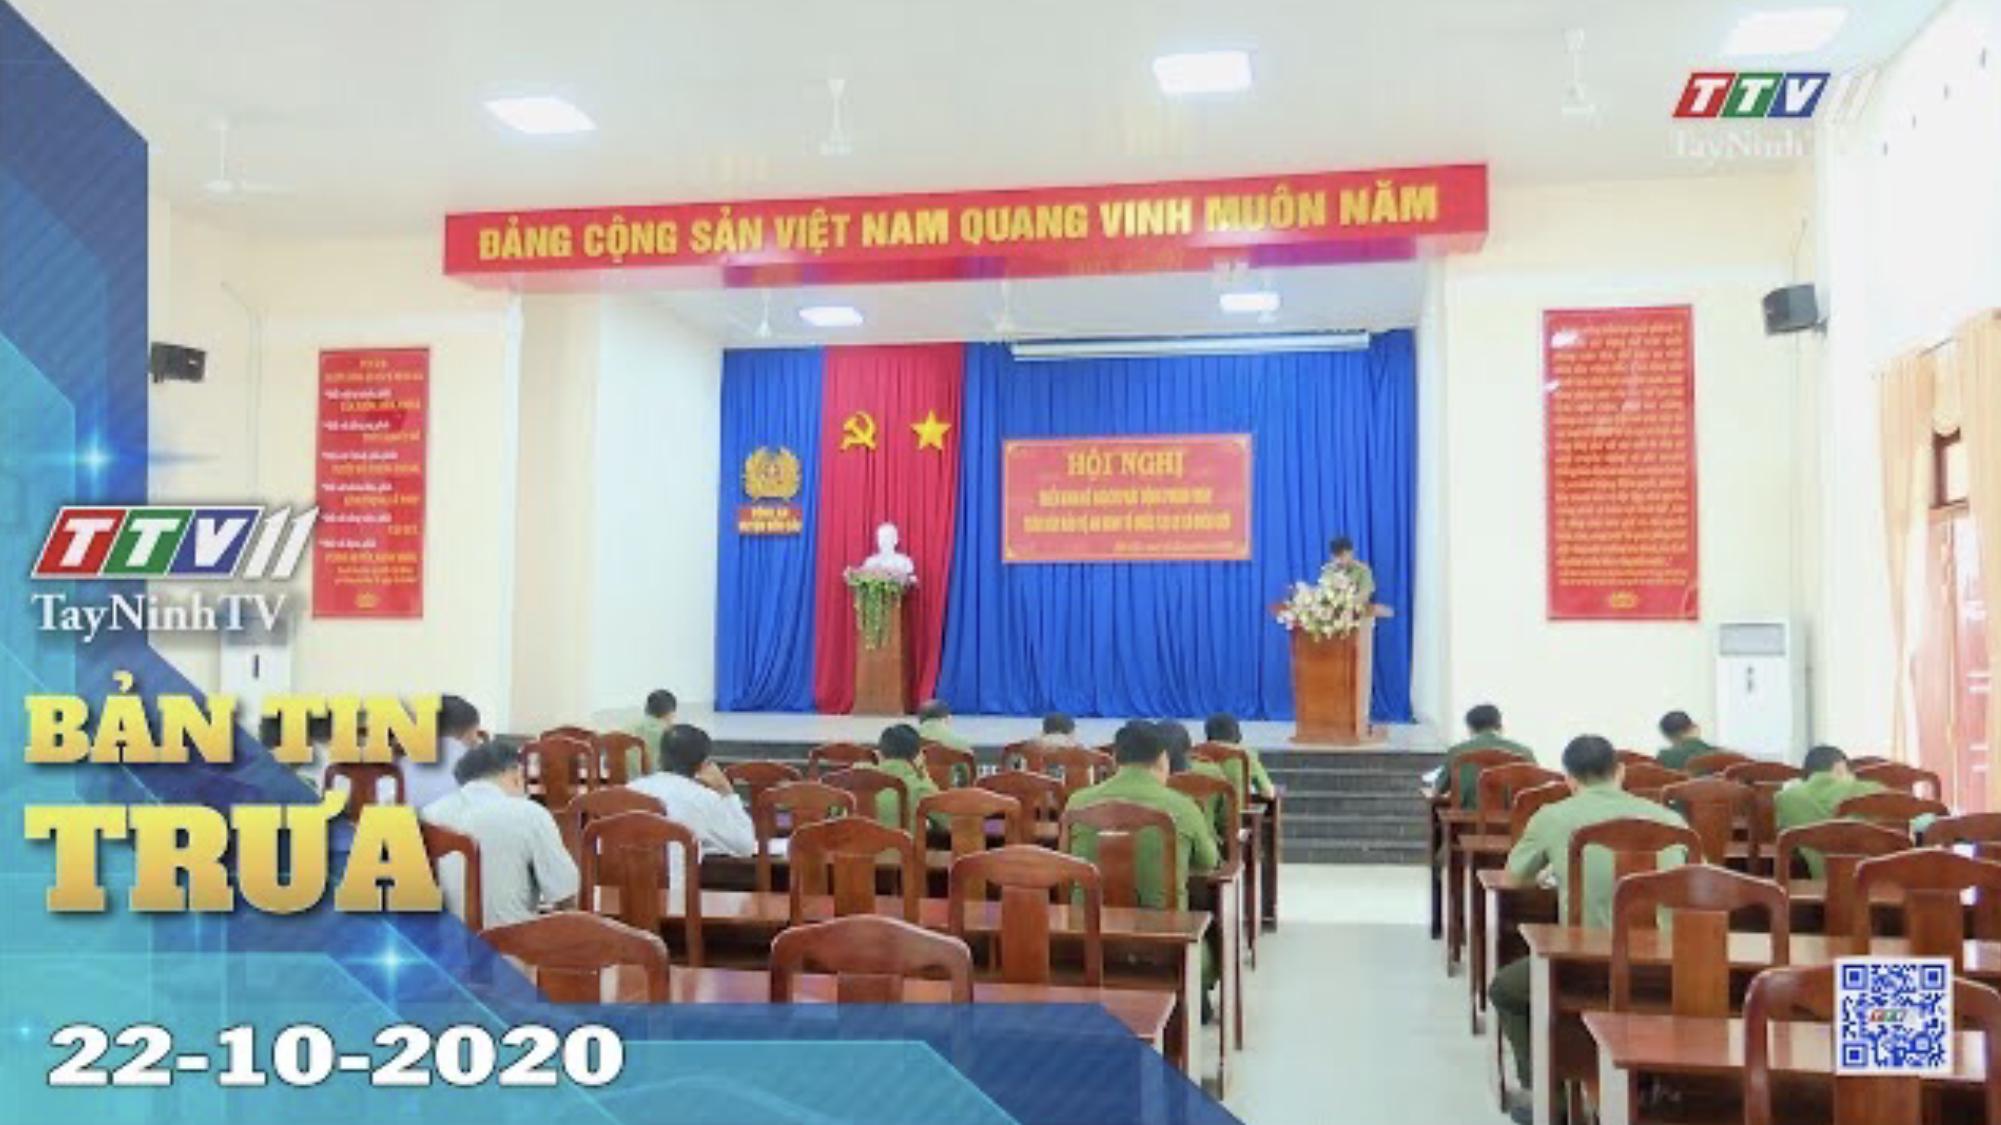 Bản tin trưa 22-10-2020 | Tin tức hôm nay | TayNinhTV